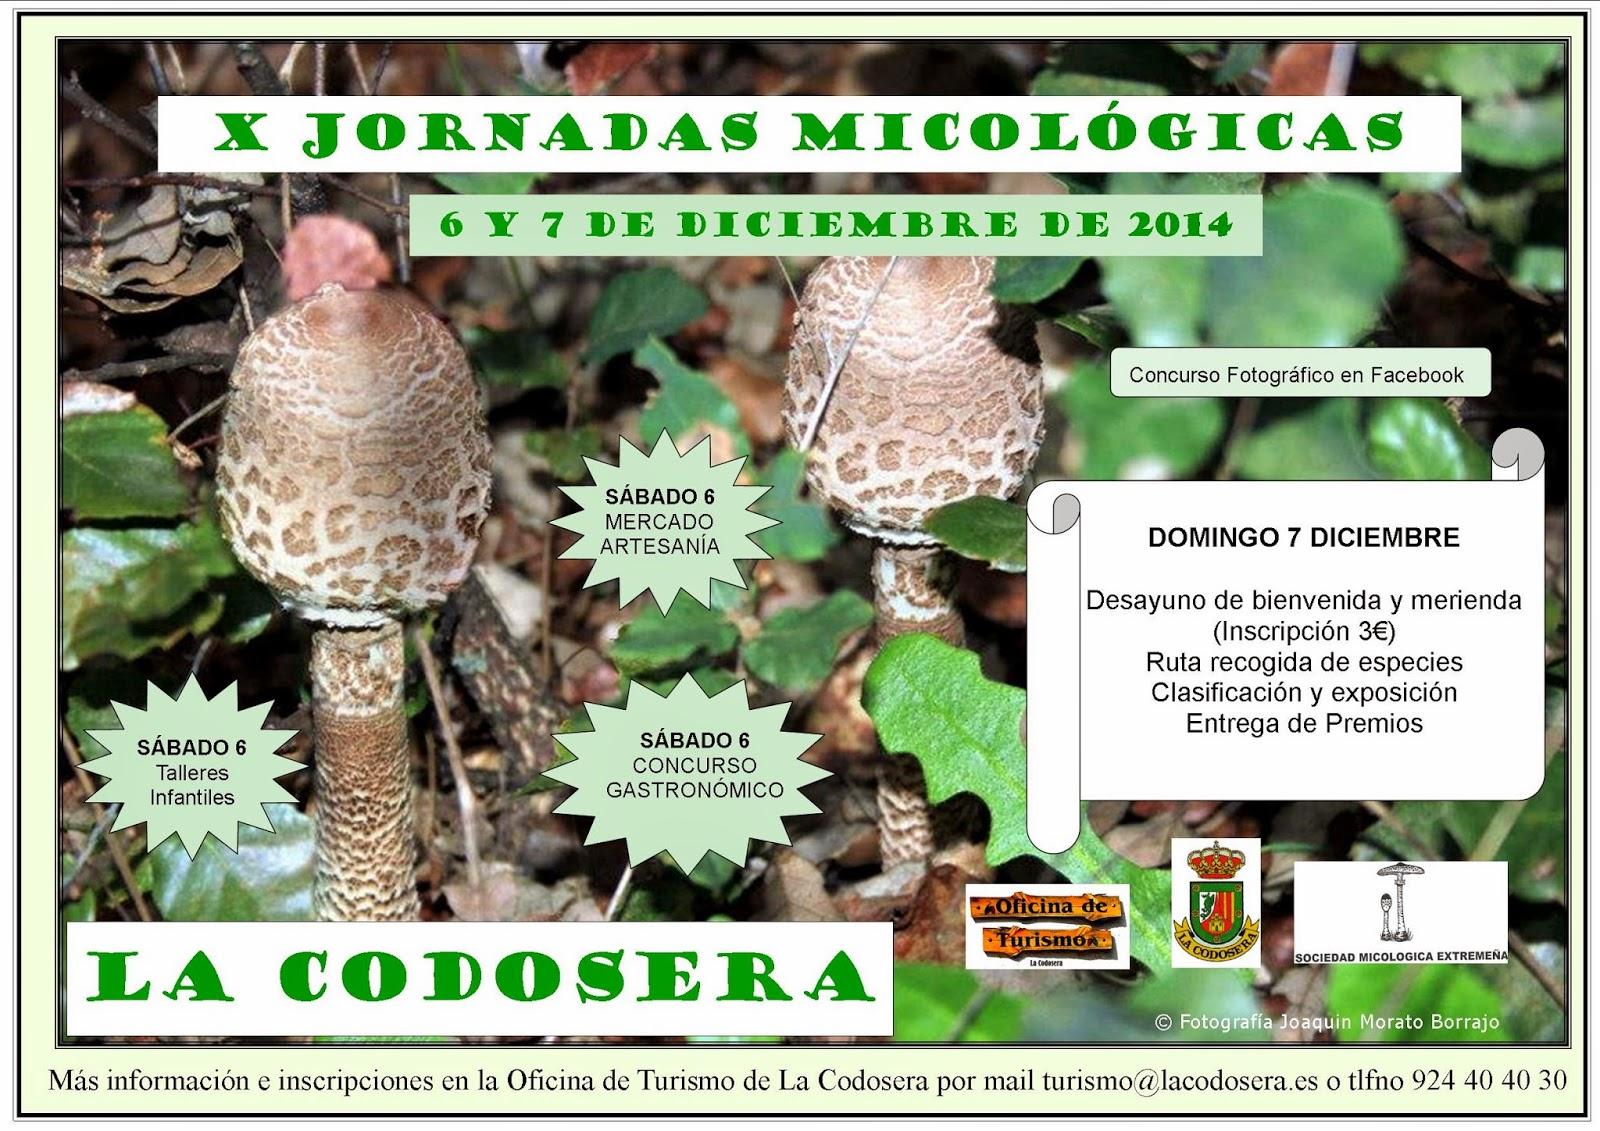 micología-setas-jornadas